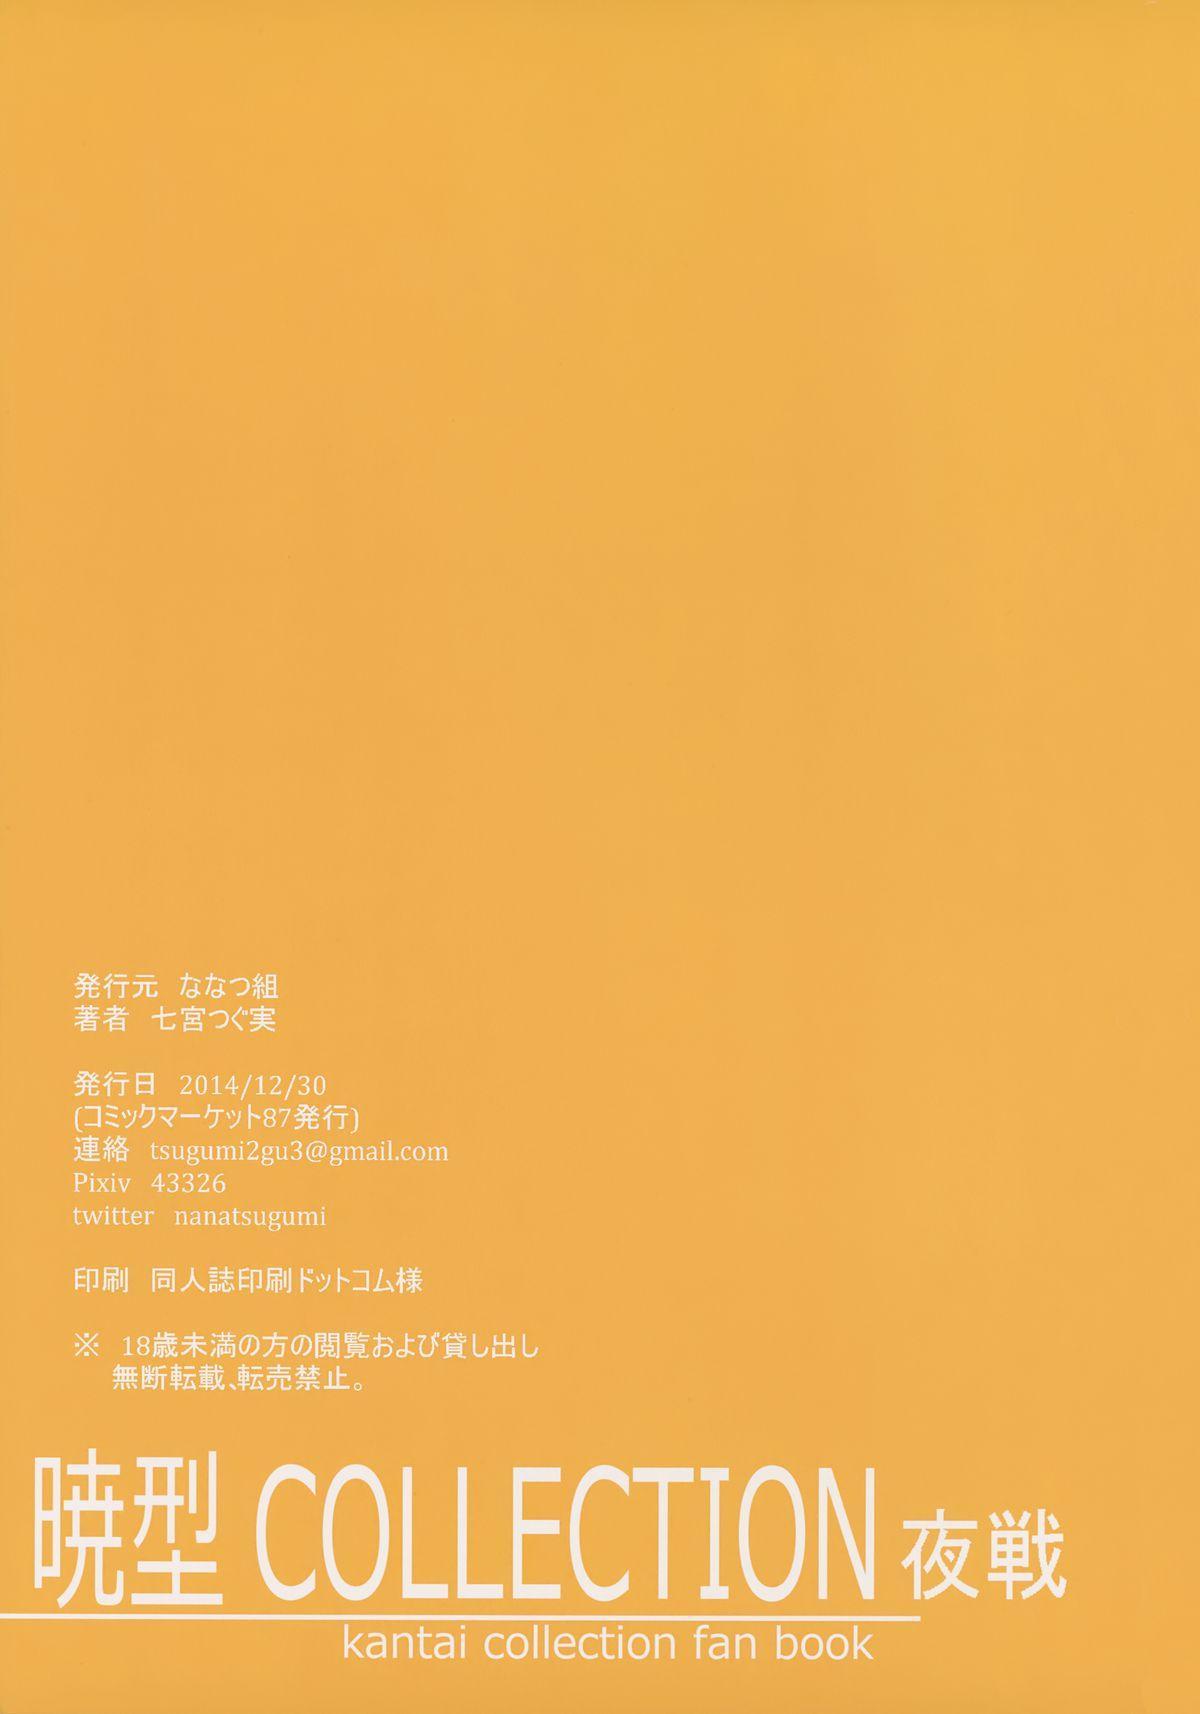 Akatsuki-gata Collection Yasen 22